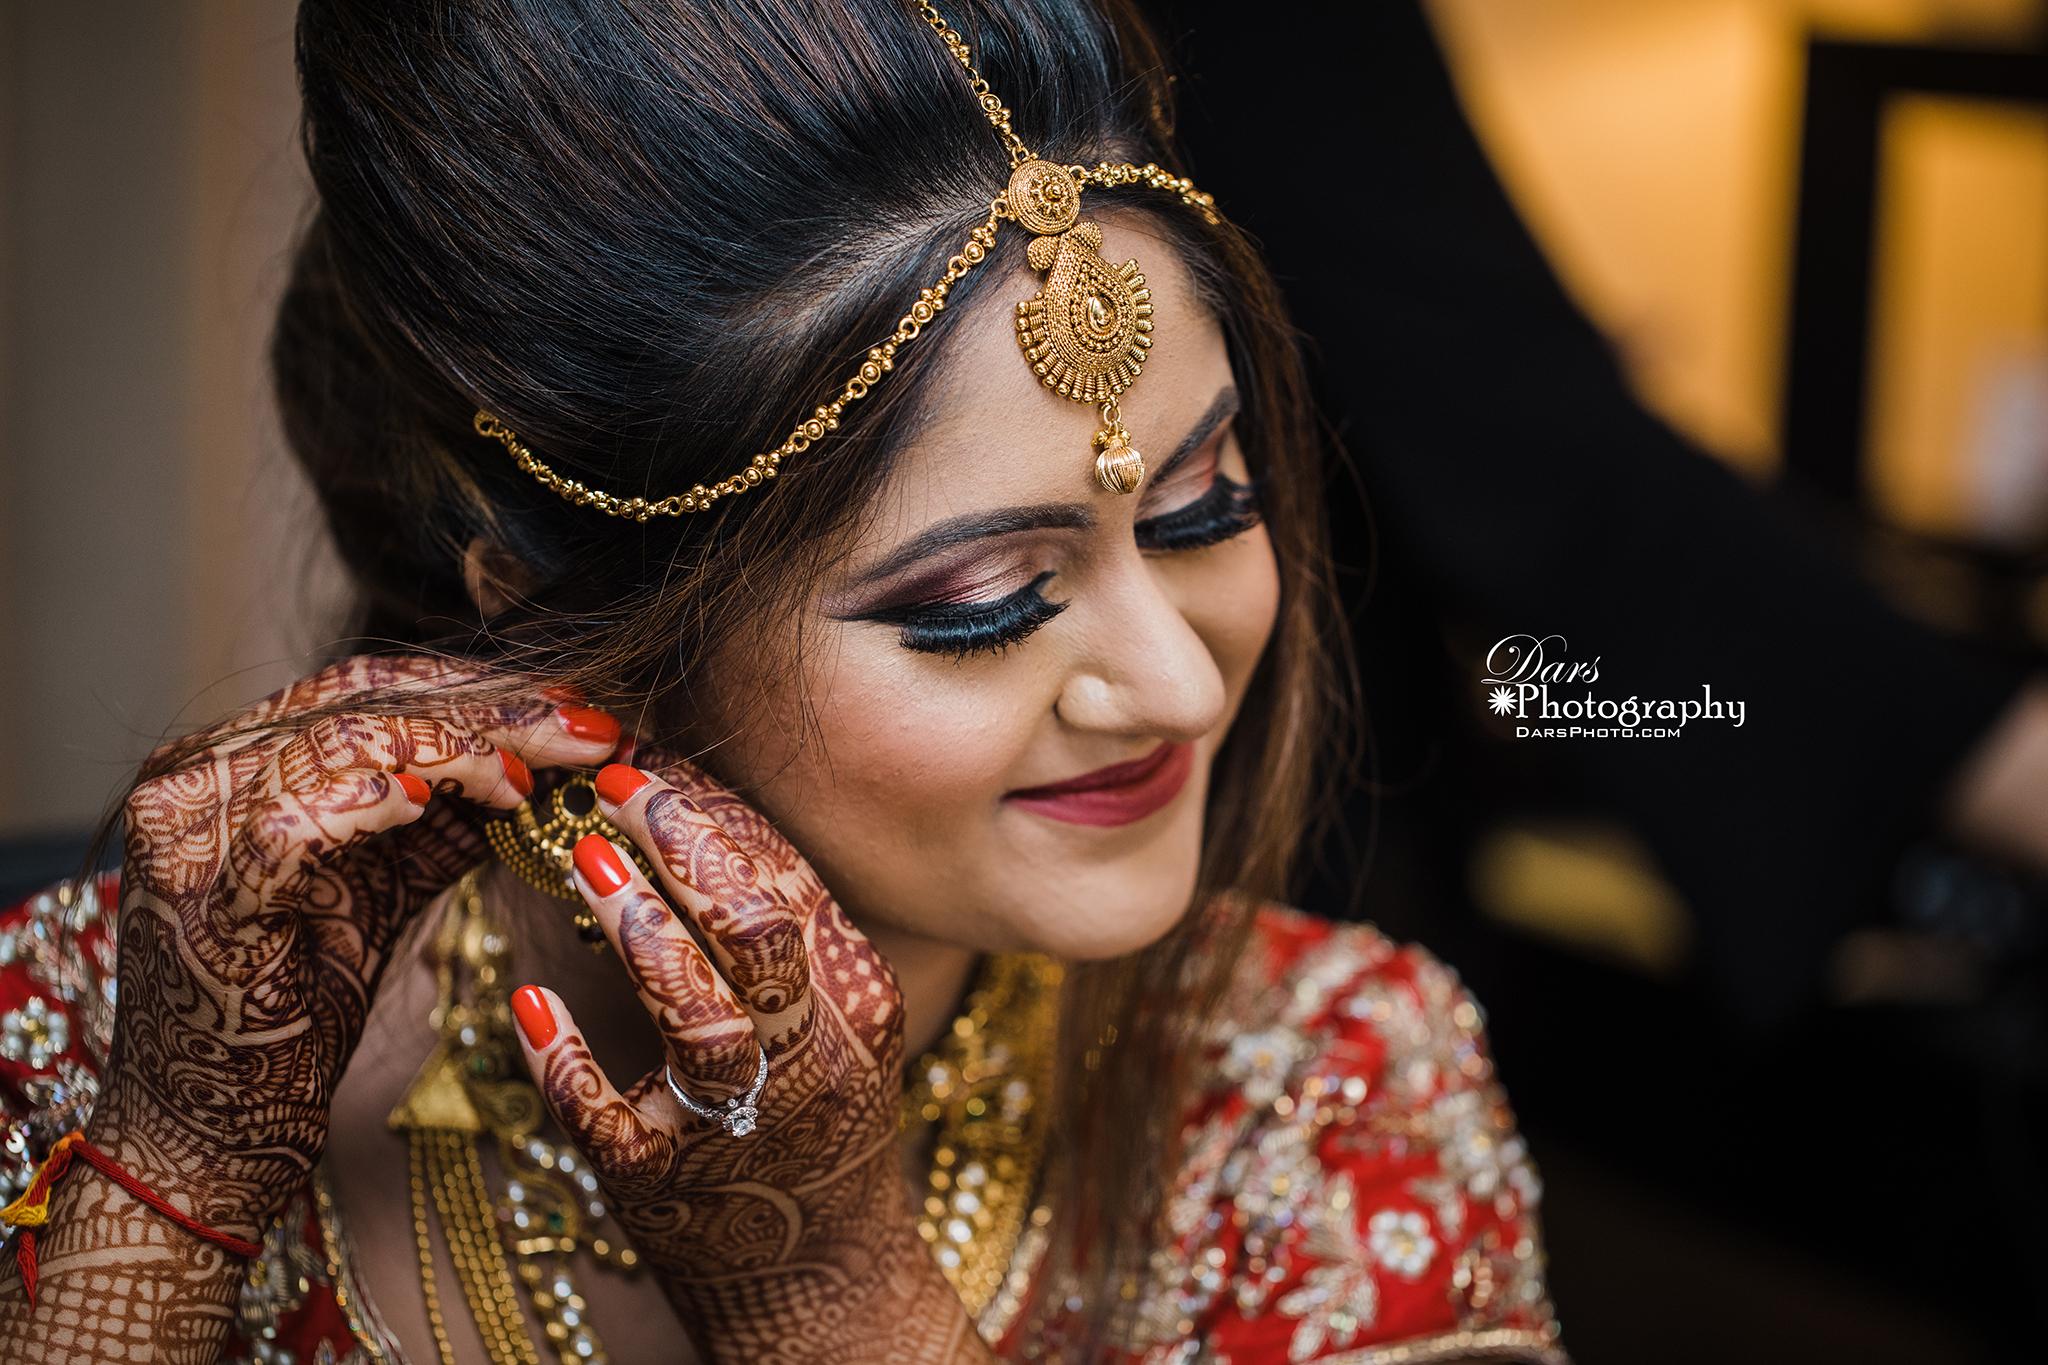 Indian Wedding Photography Poses Pdf Wedding Photography Poses